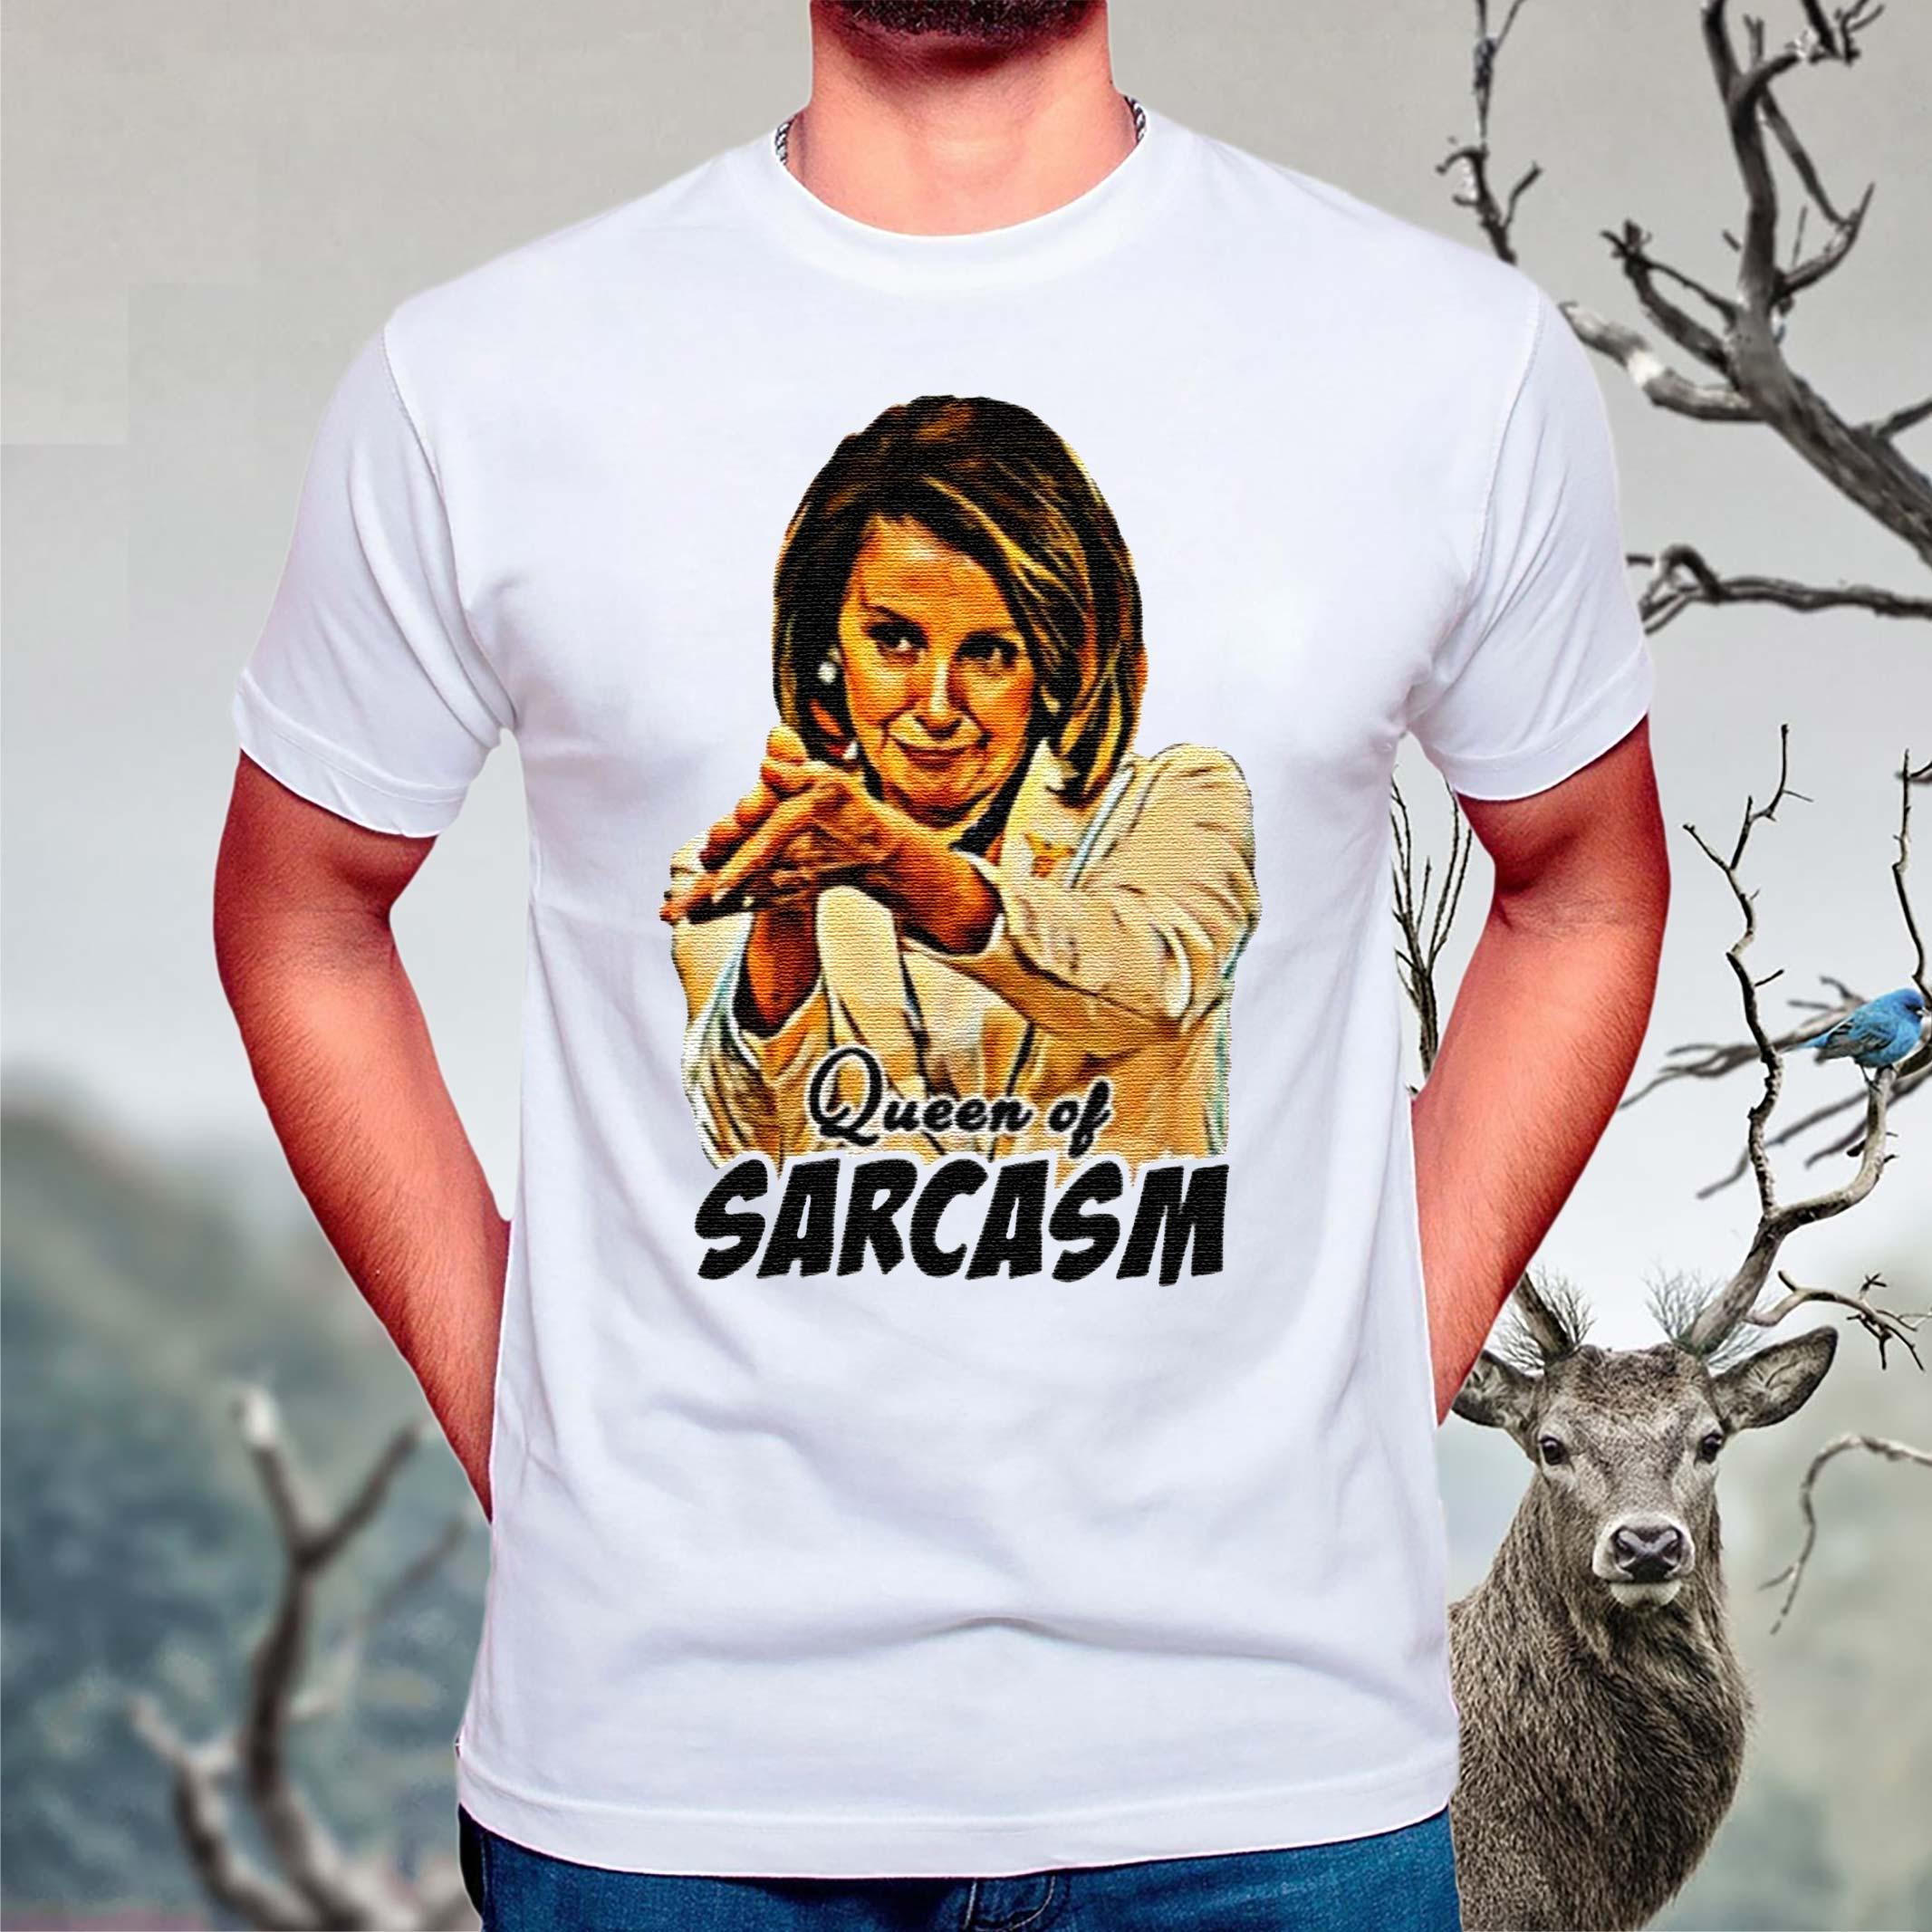 Queen-of-sarcasm-t-shirt